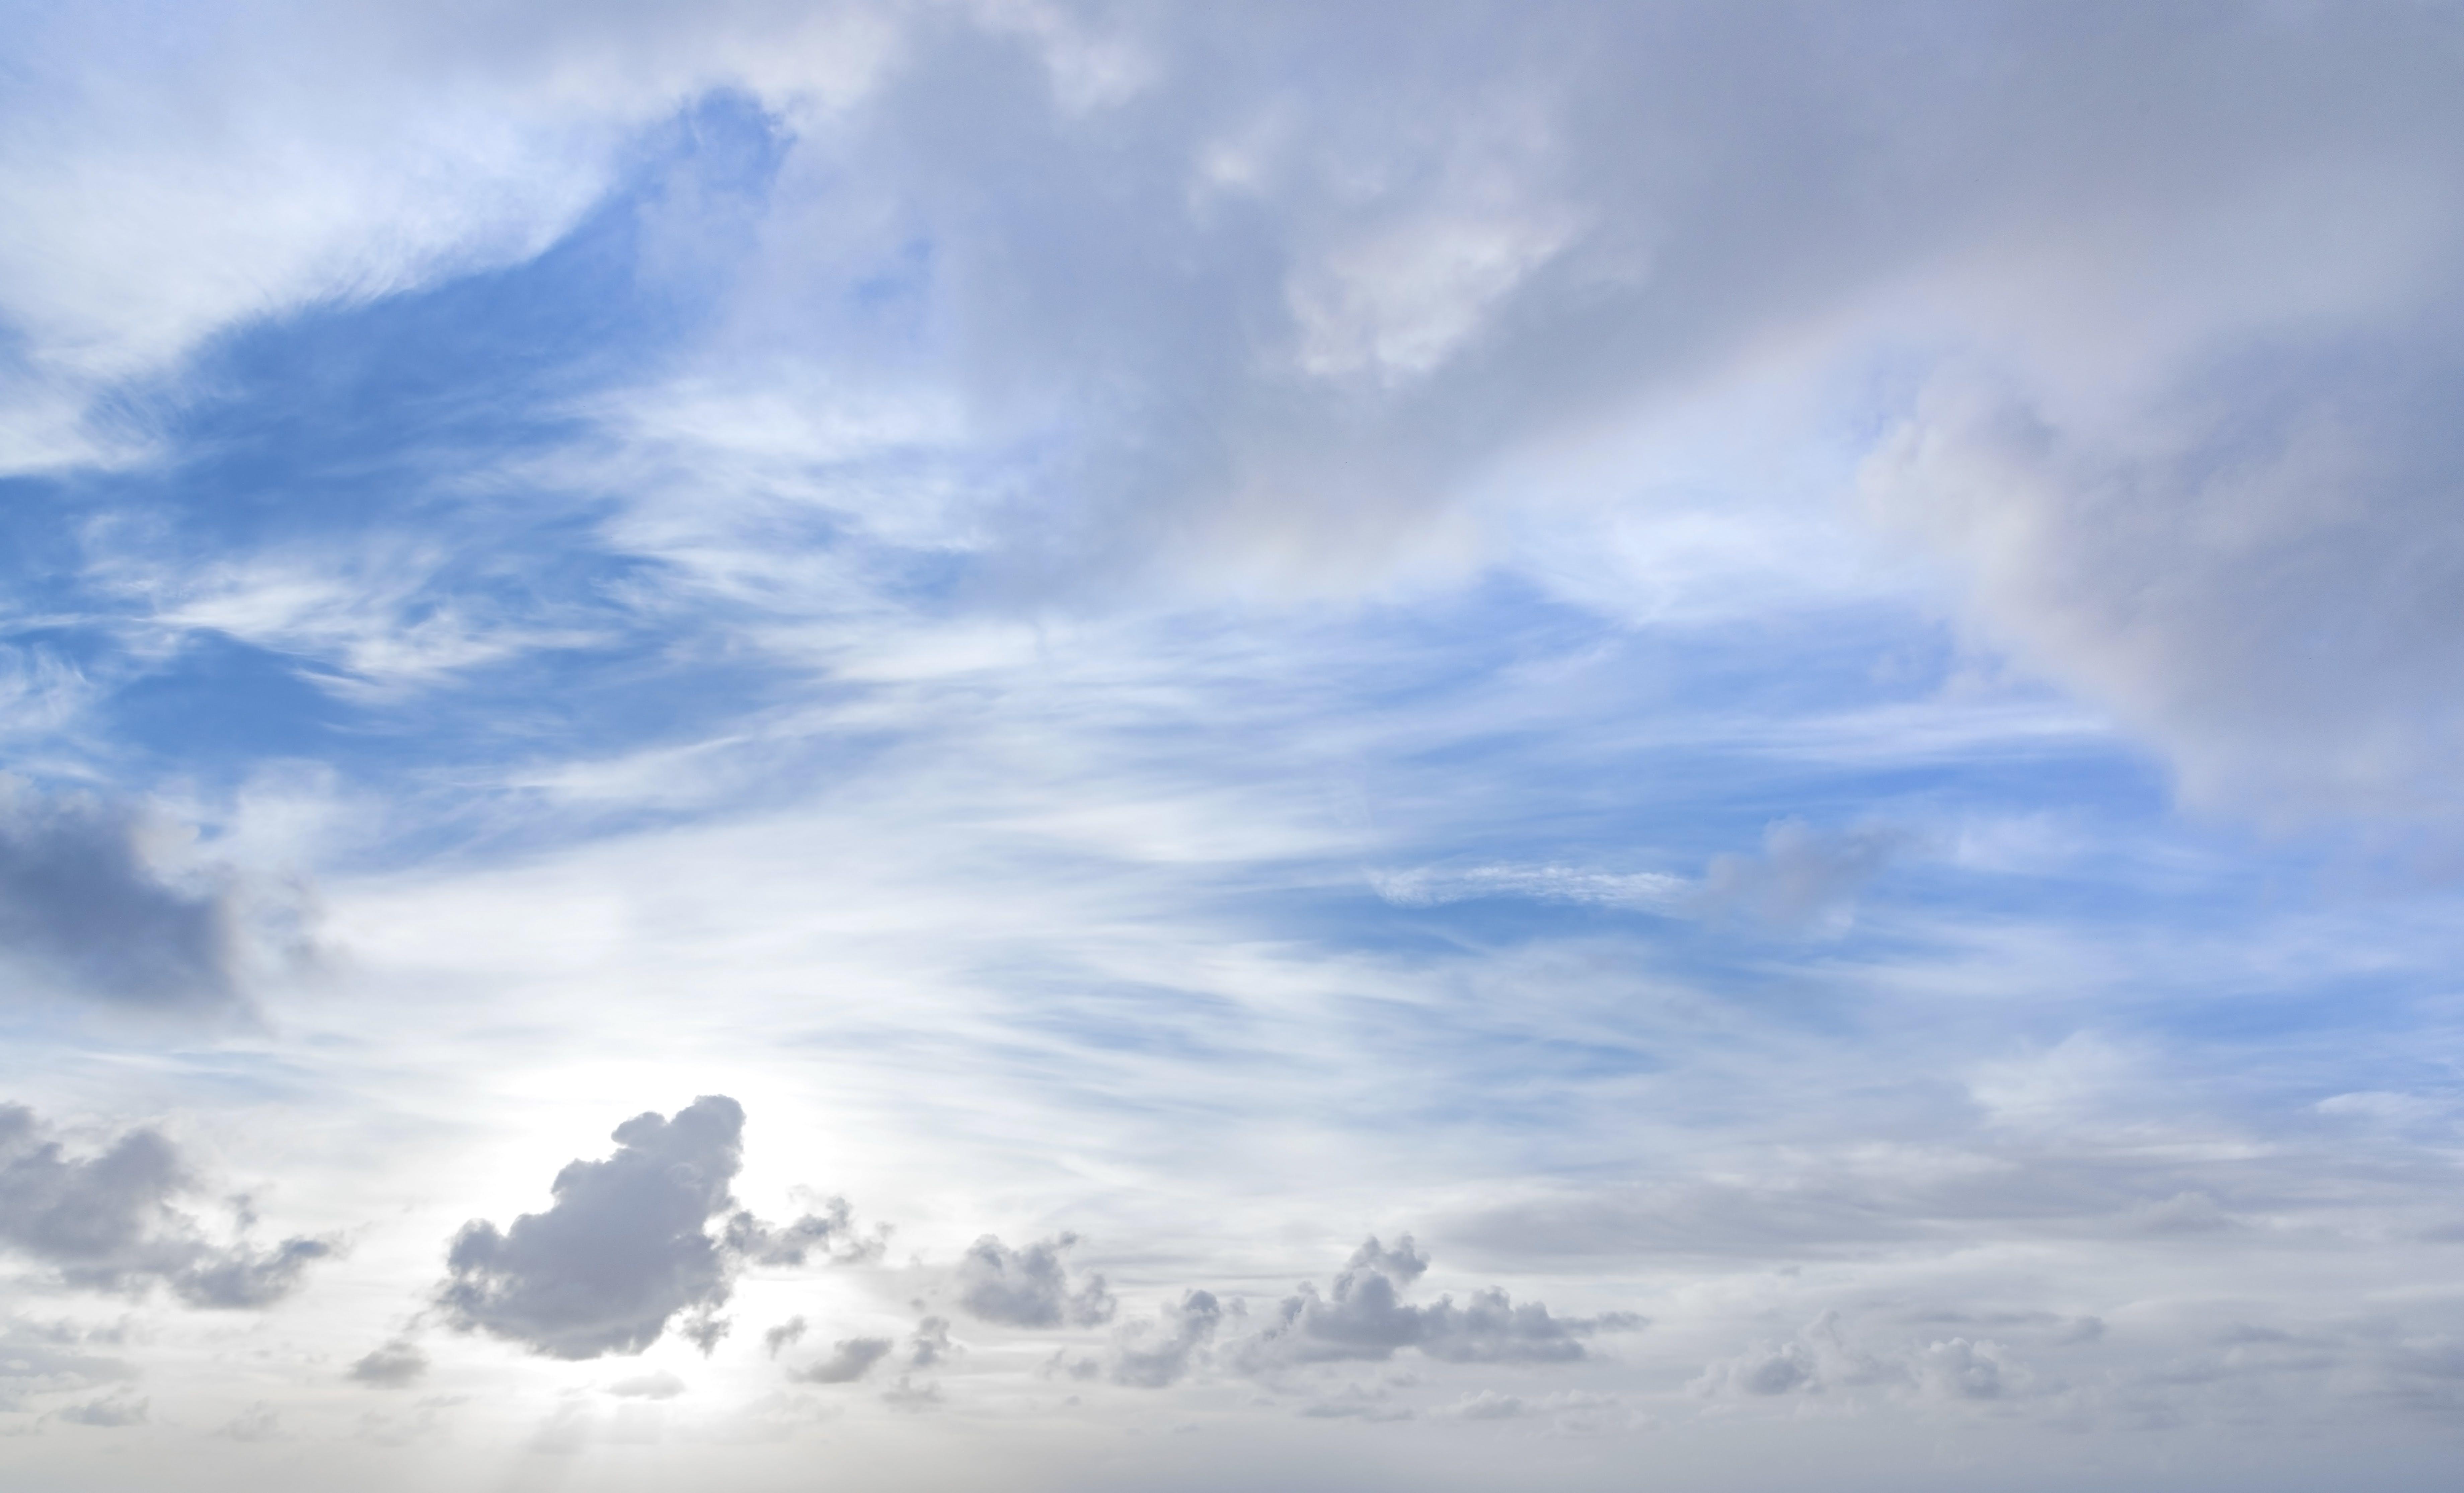 Foto stok gratis alam, awan, bentangan awan, cerah